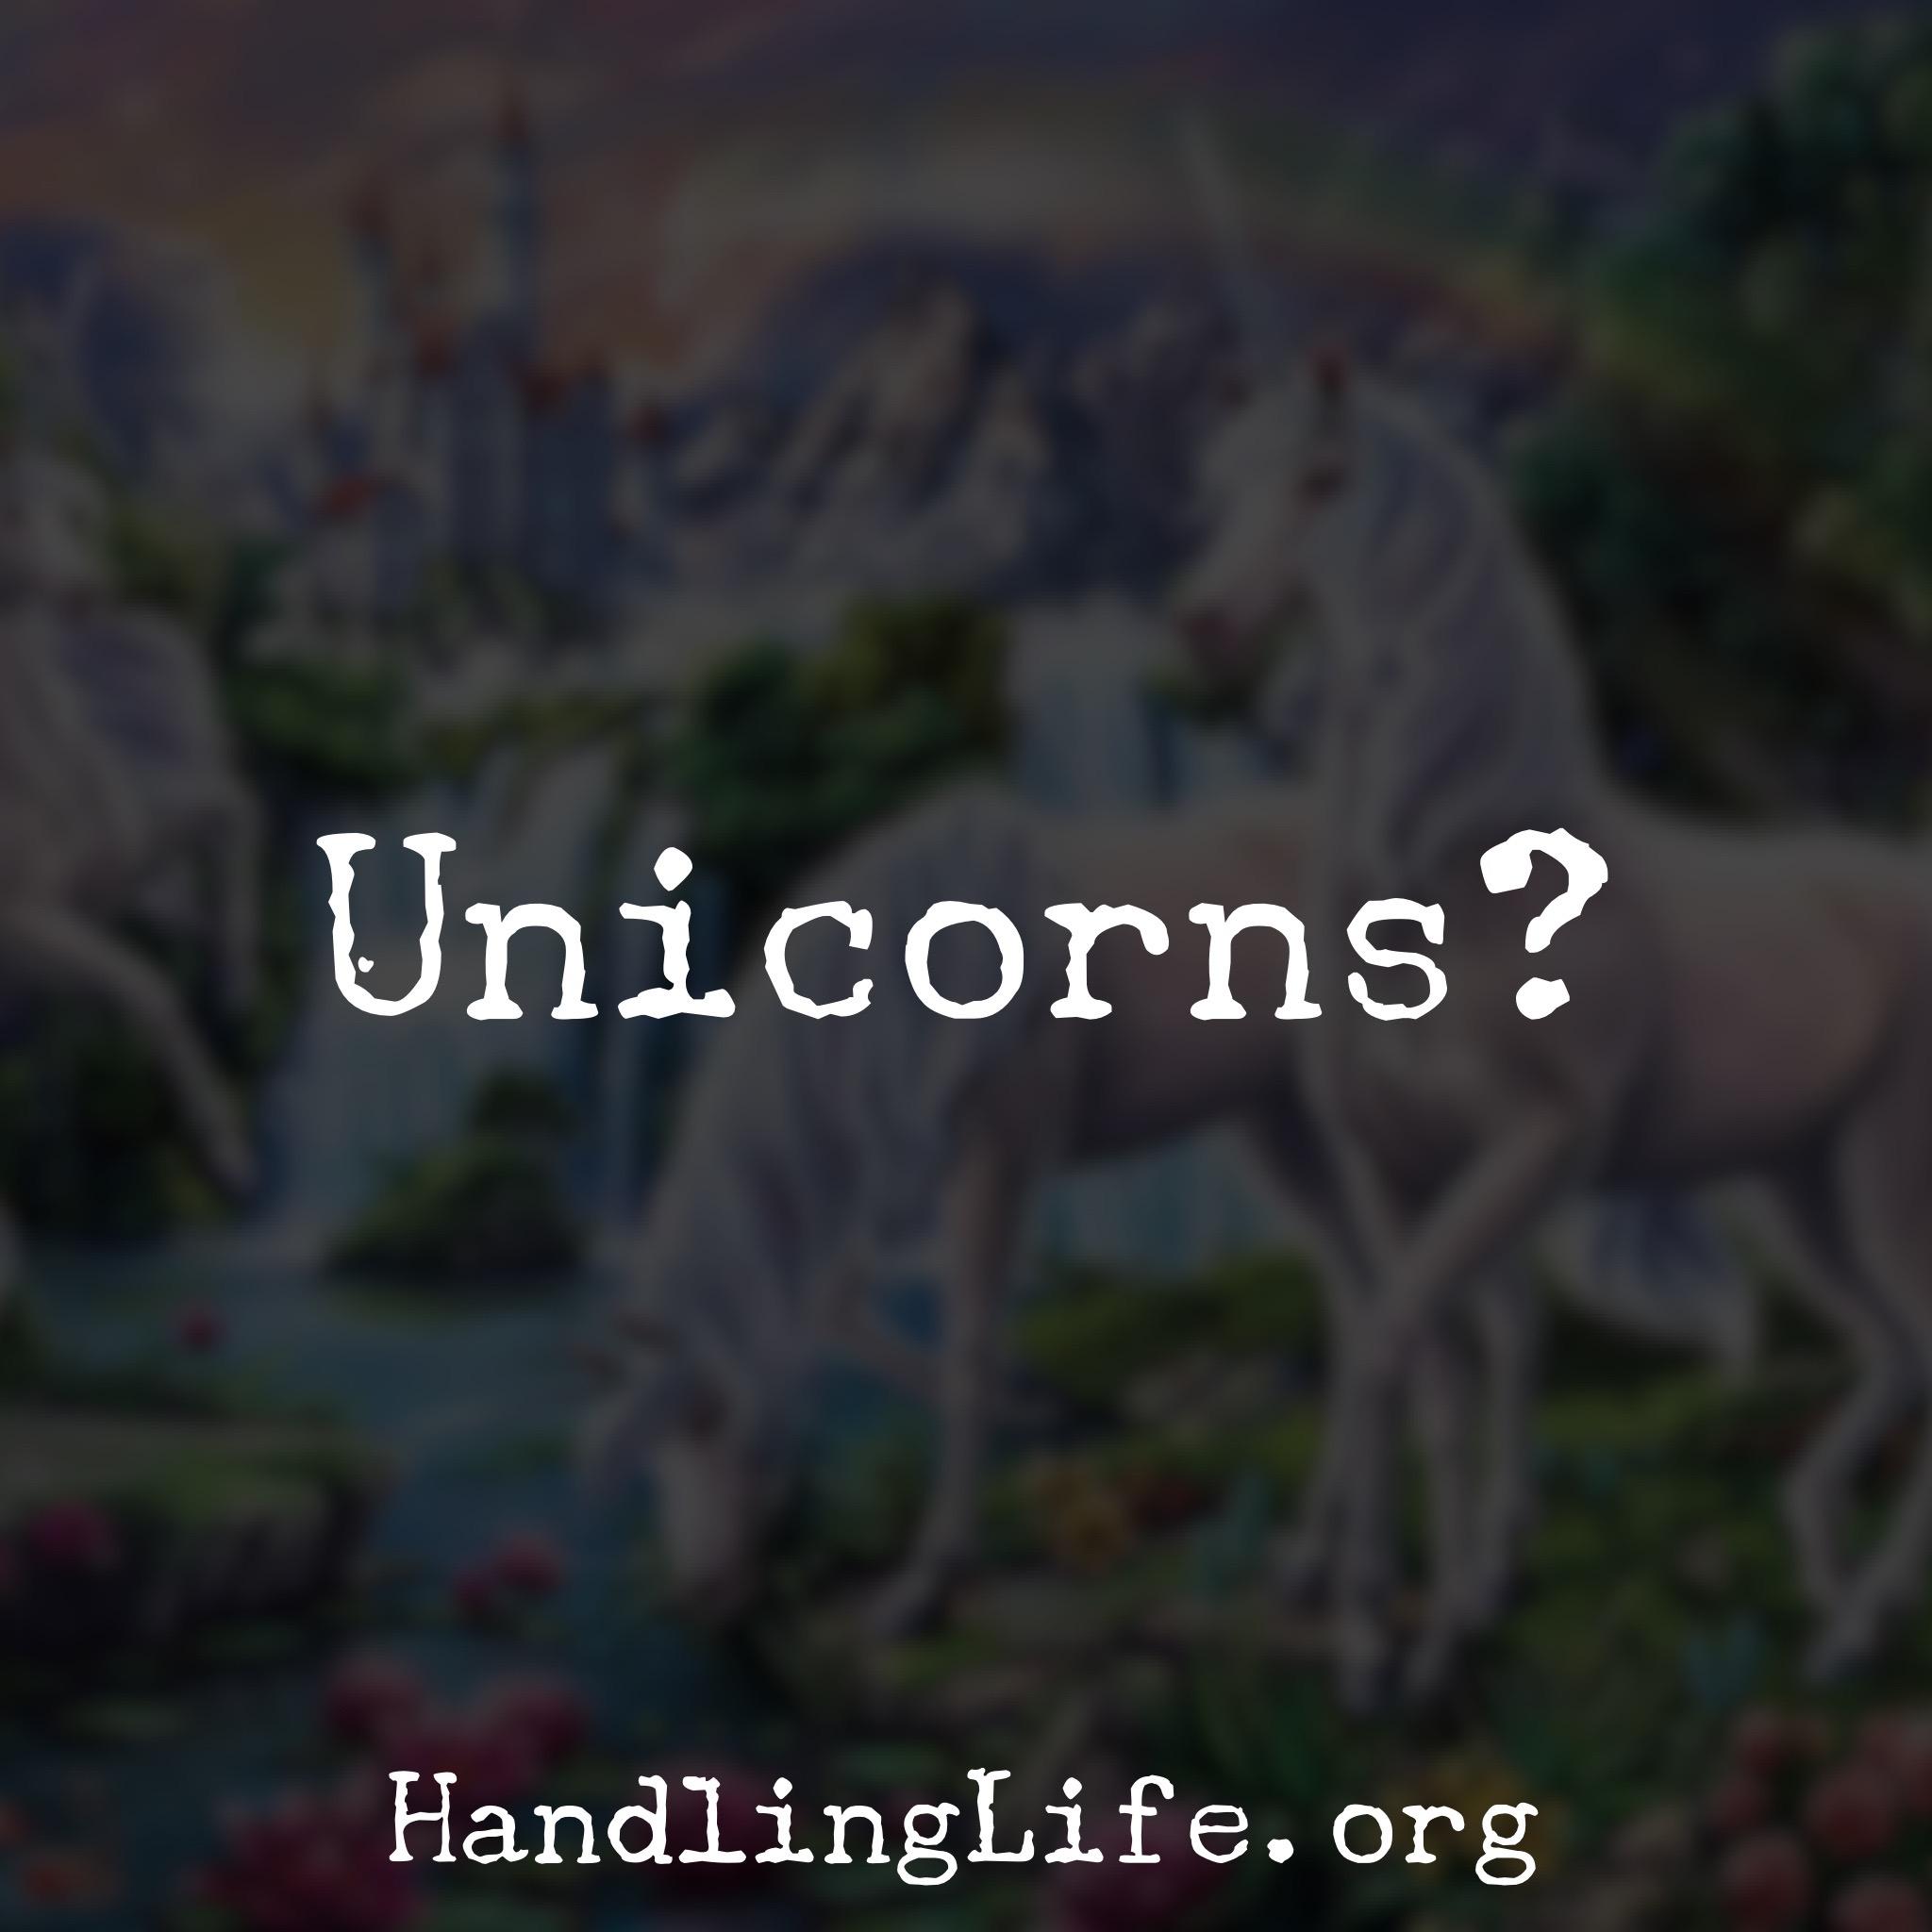 Artwork for Unicorns?